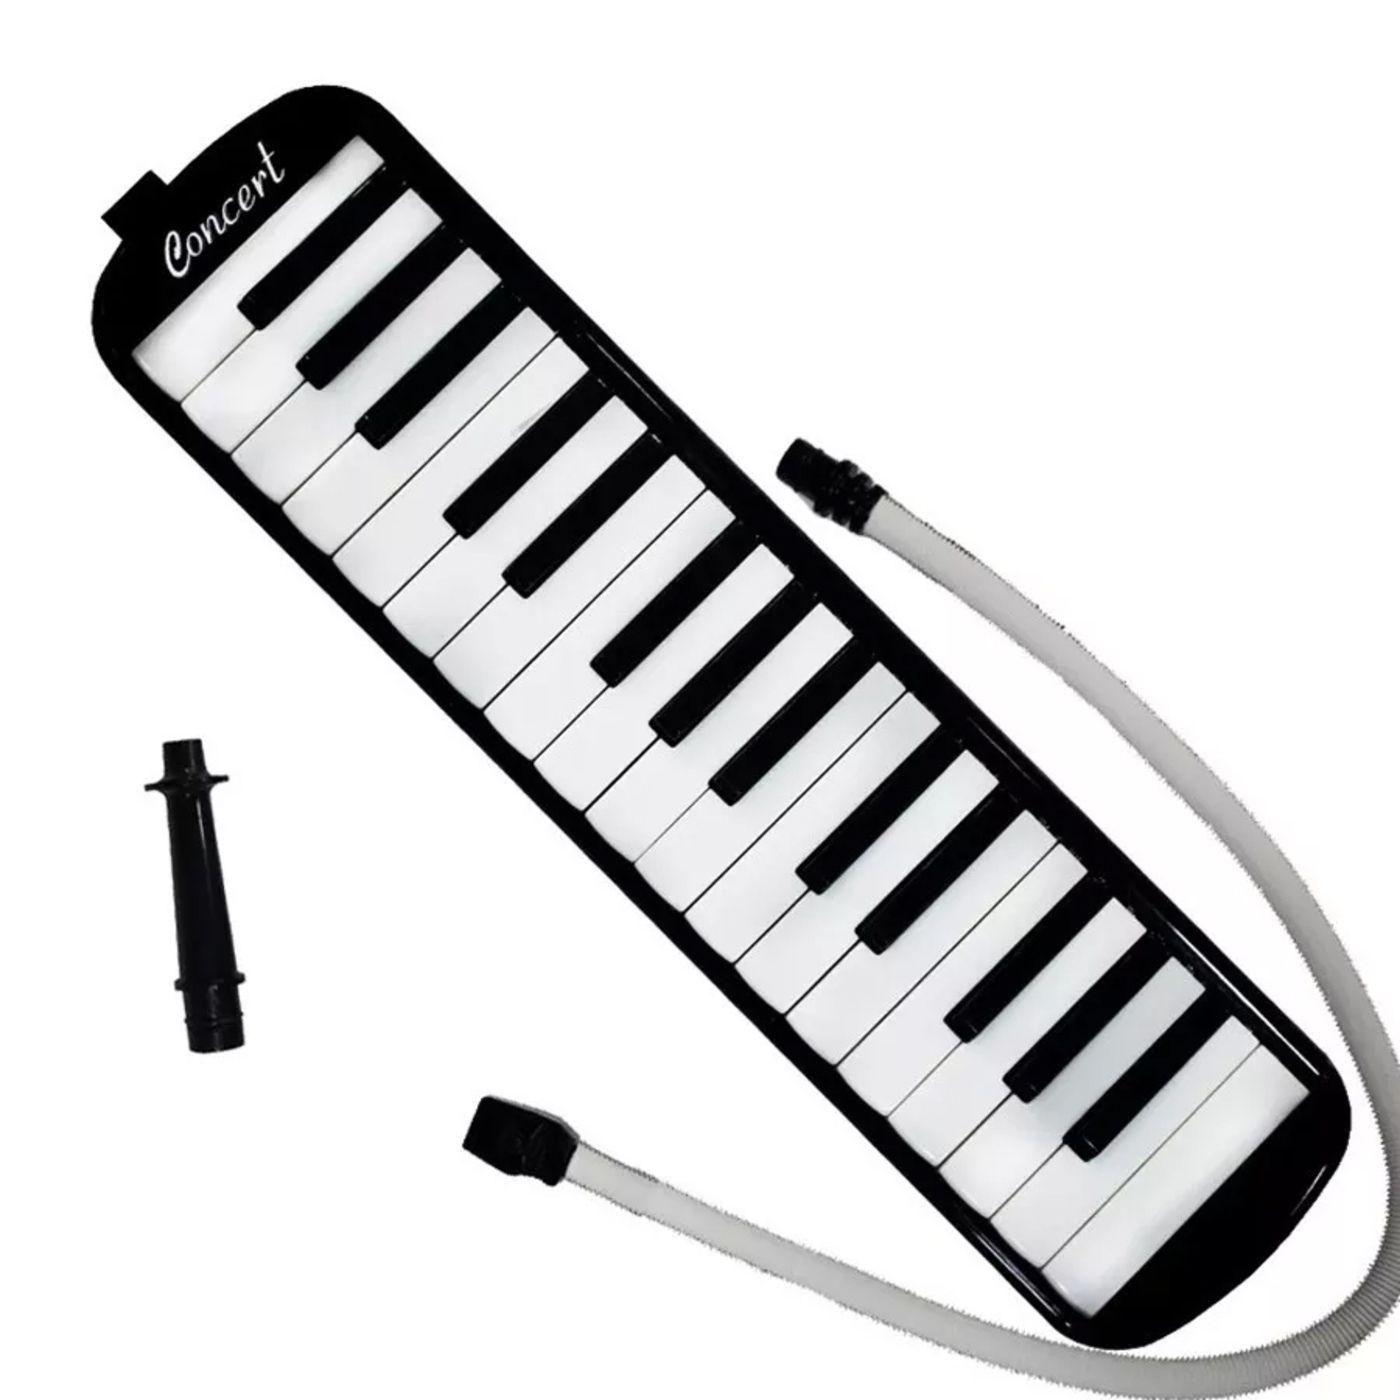 Escaleta Concert 32 Teclas Preta  - Luggi Instrumentos Musicais